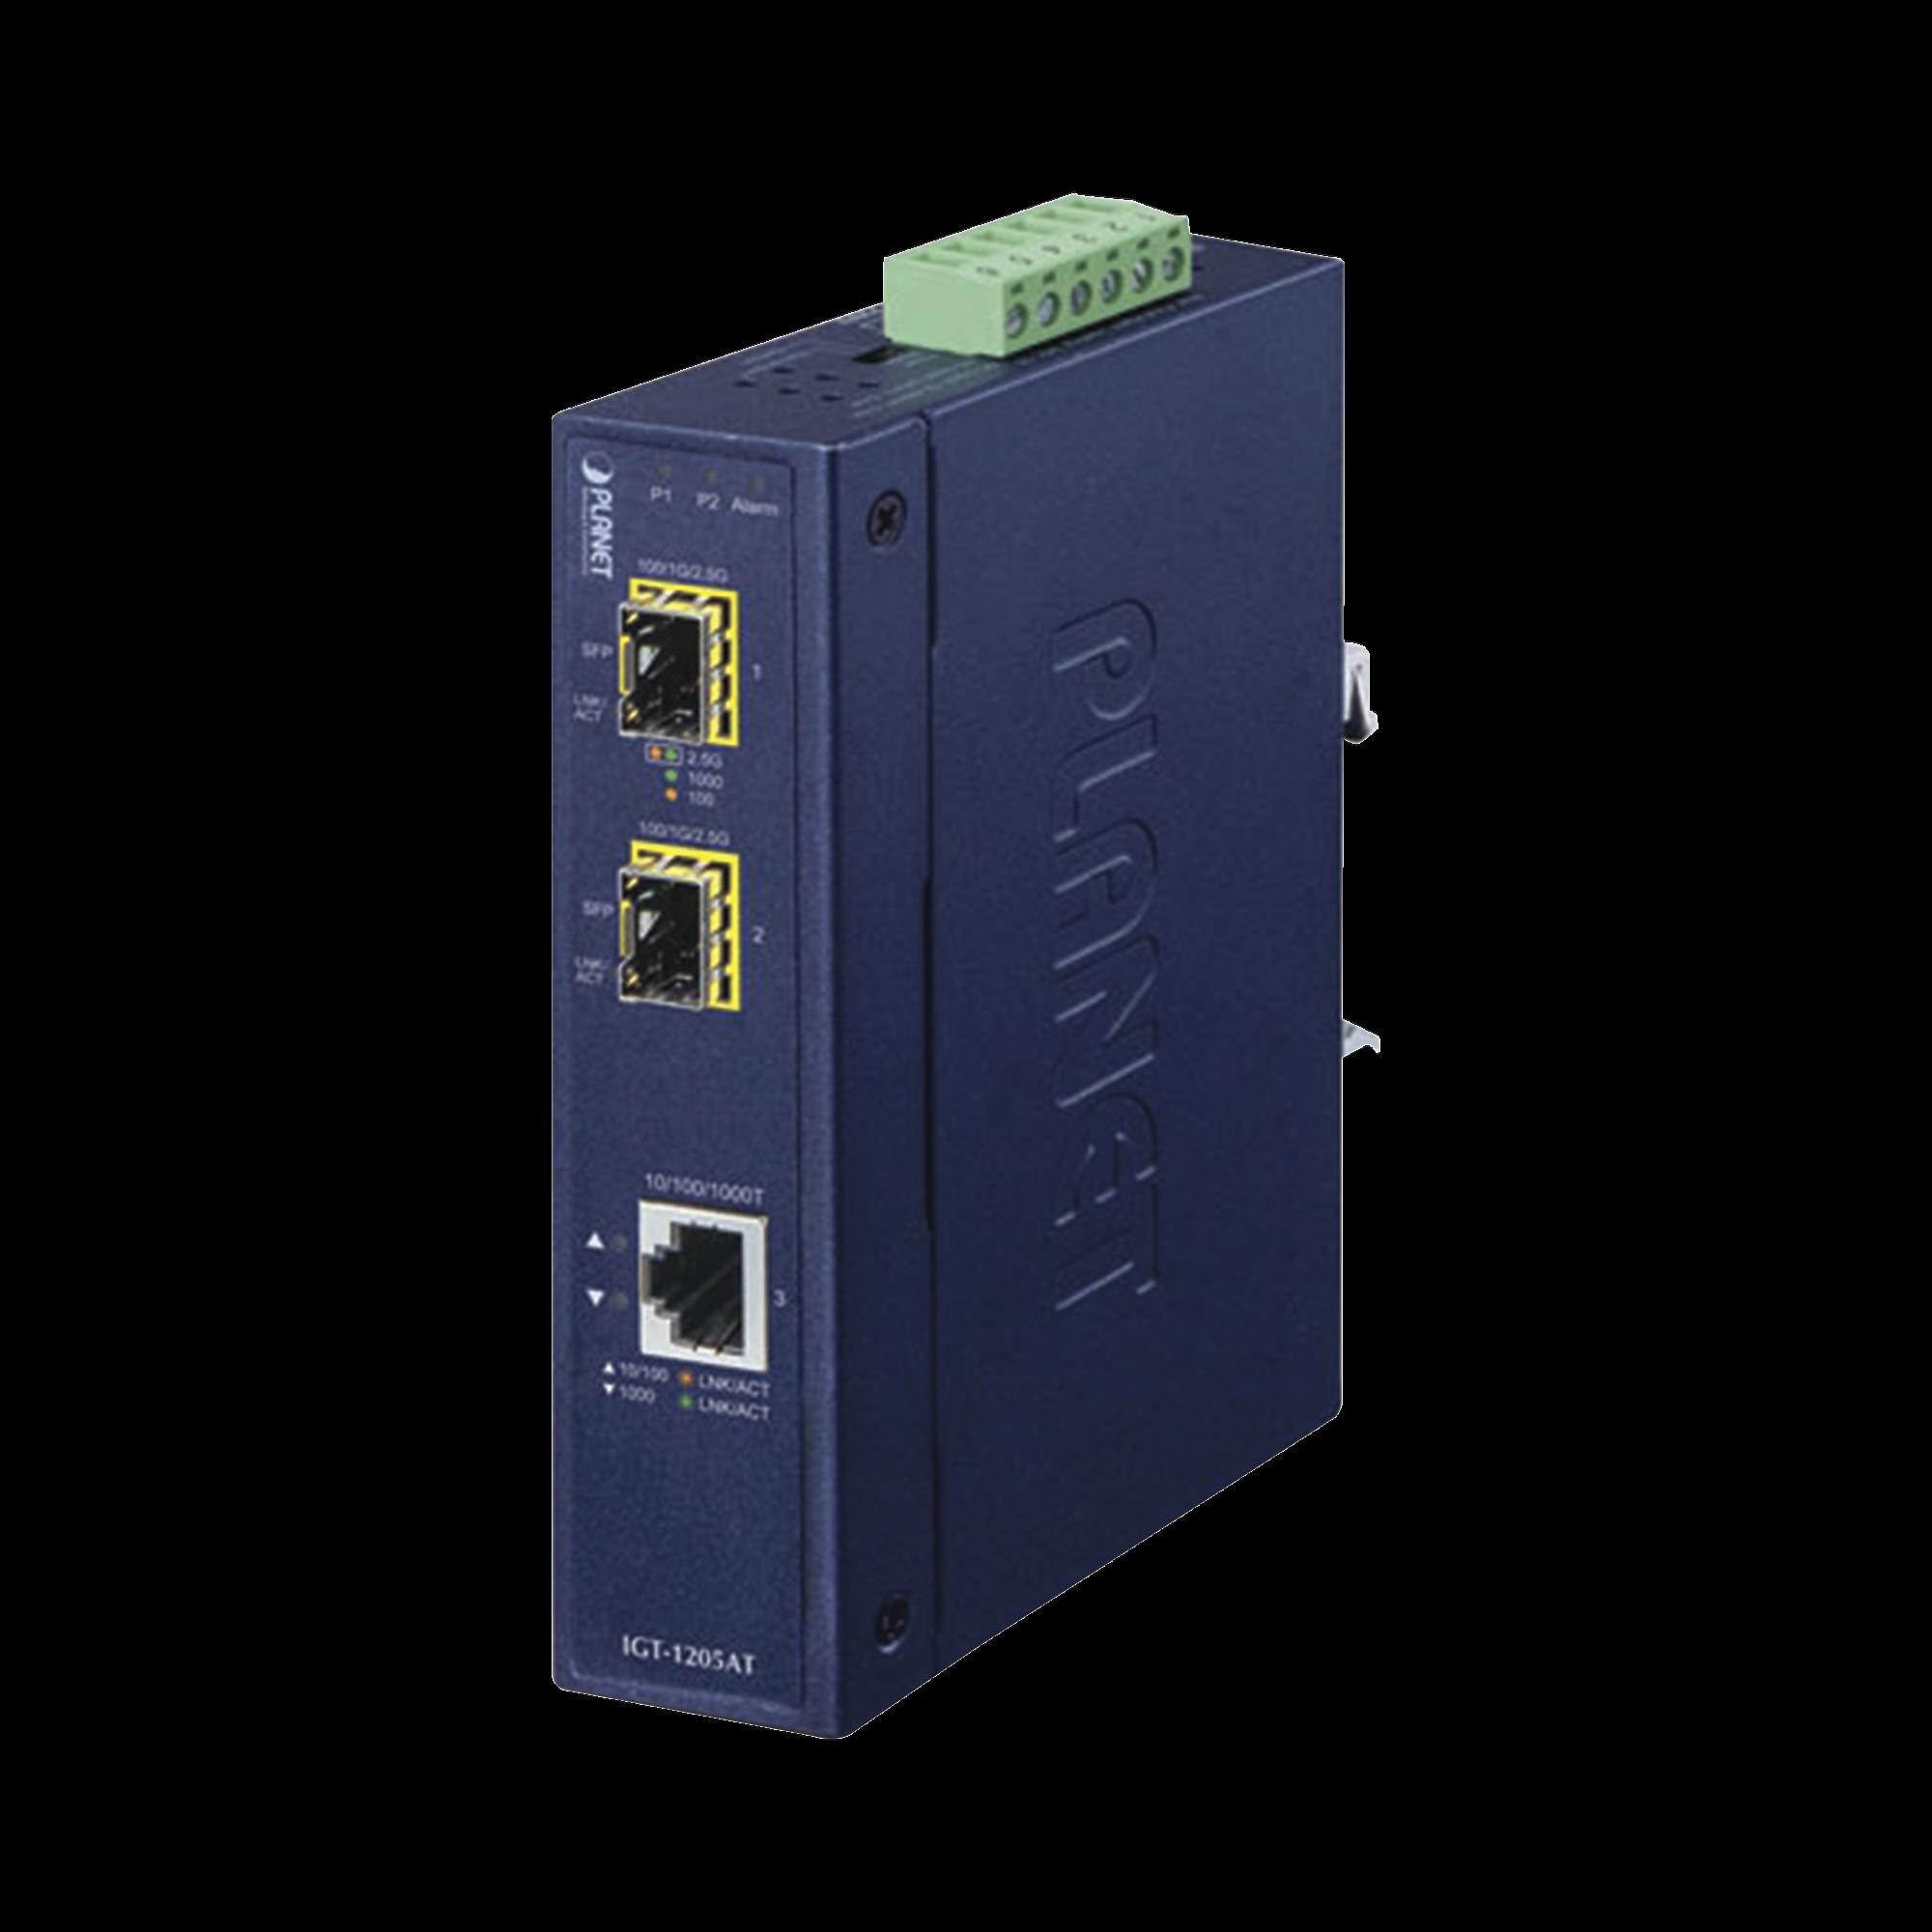 Convertidor de Medios Industrial 10/100/1000 Base-T a 2puertos 100/1000 Base-X SFP